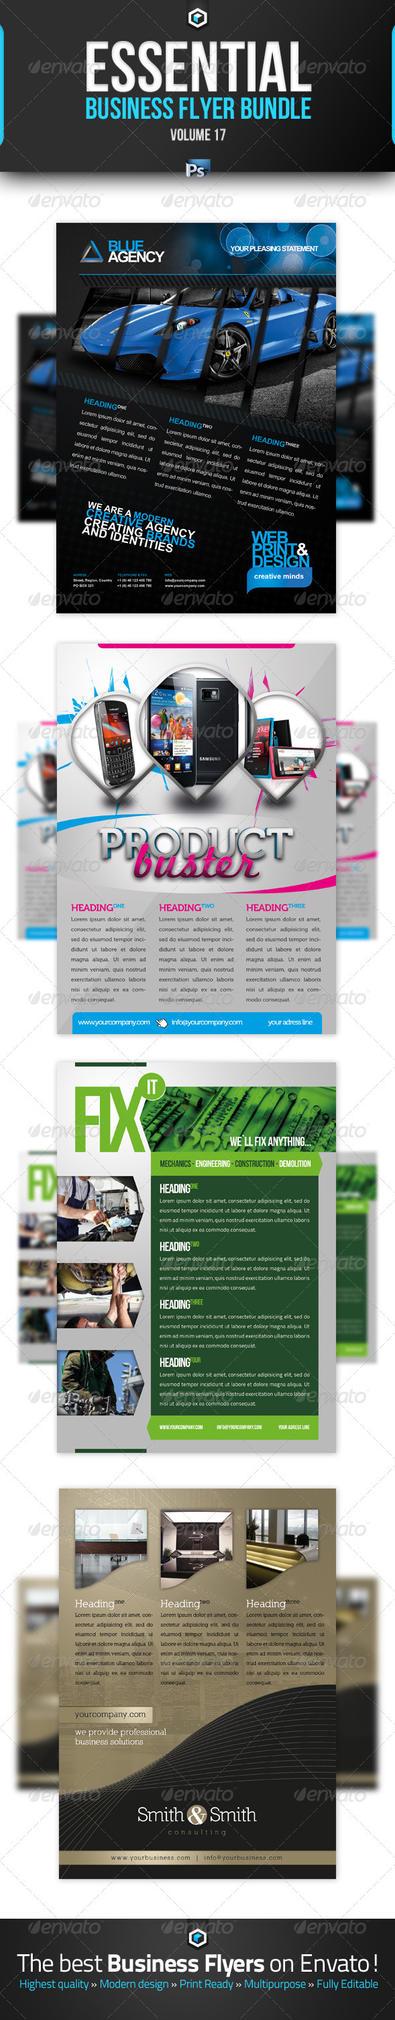 RW Essential Business Flyer Bundle Vol 17 by Reclameworks